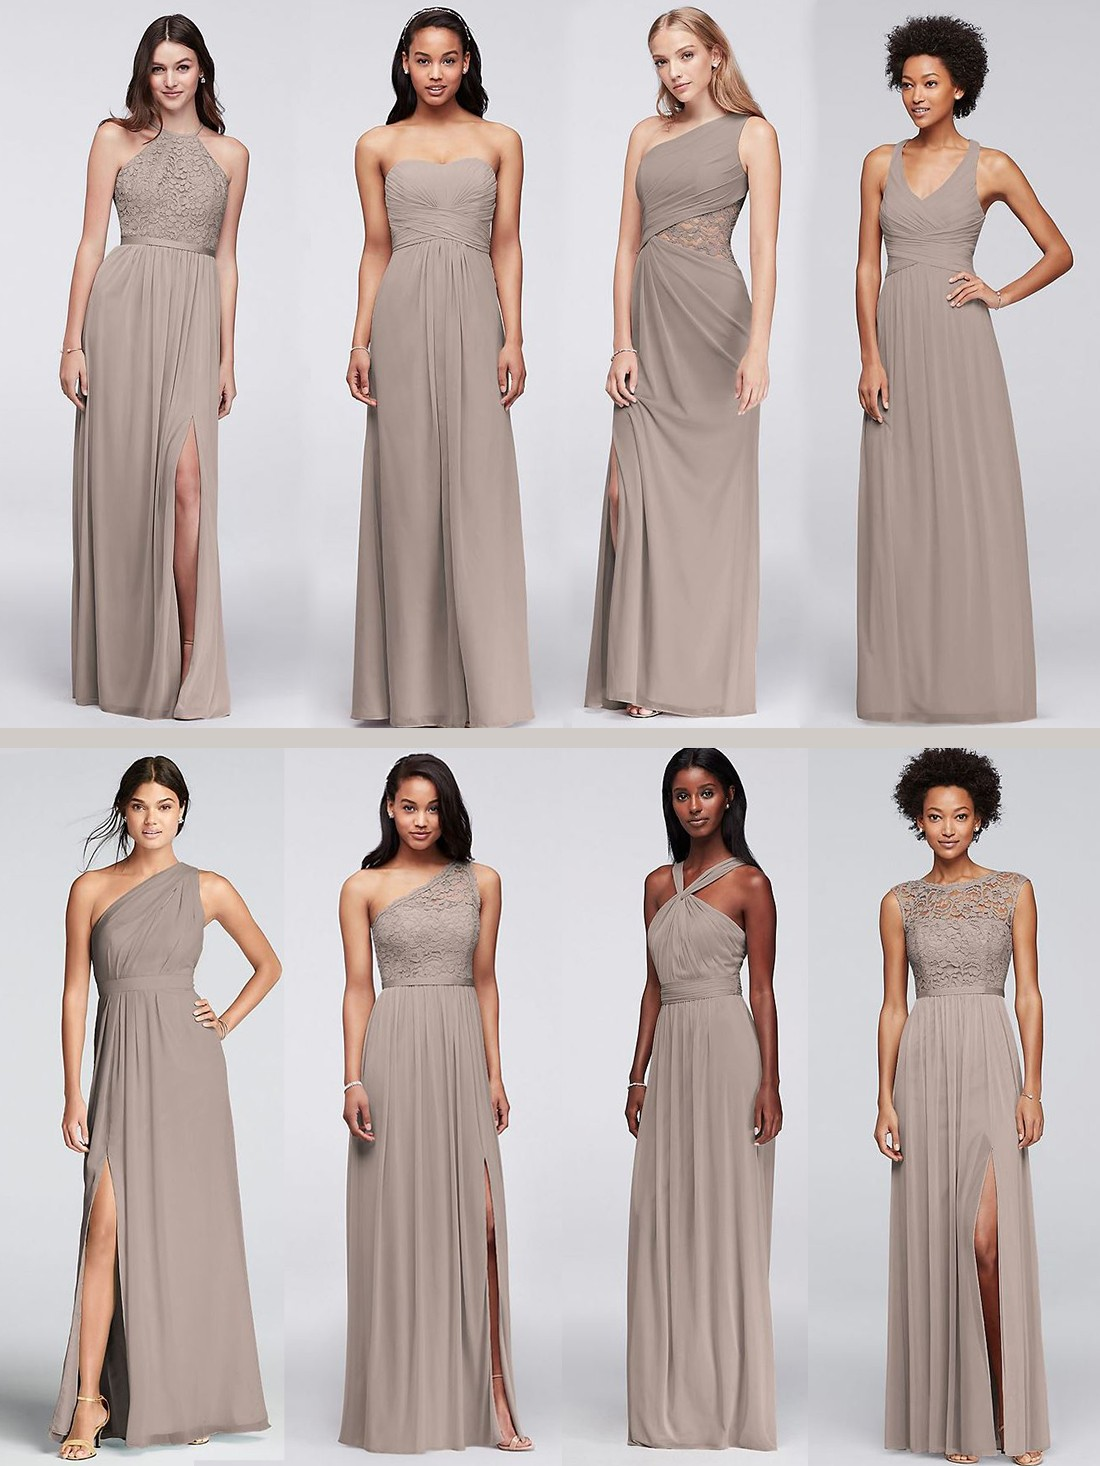 David\'s Bridal Mix and Match Bridesmaids Dresses | Bride Guide